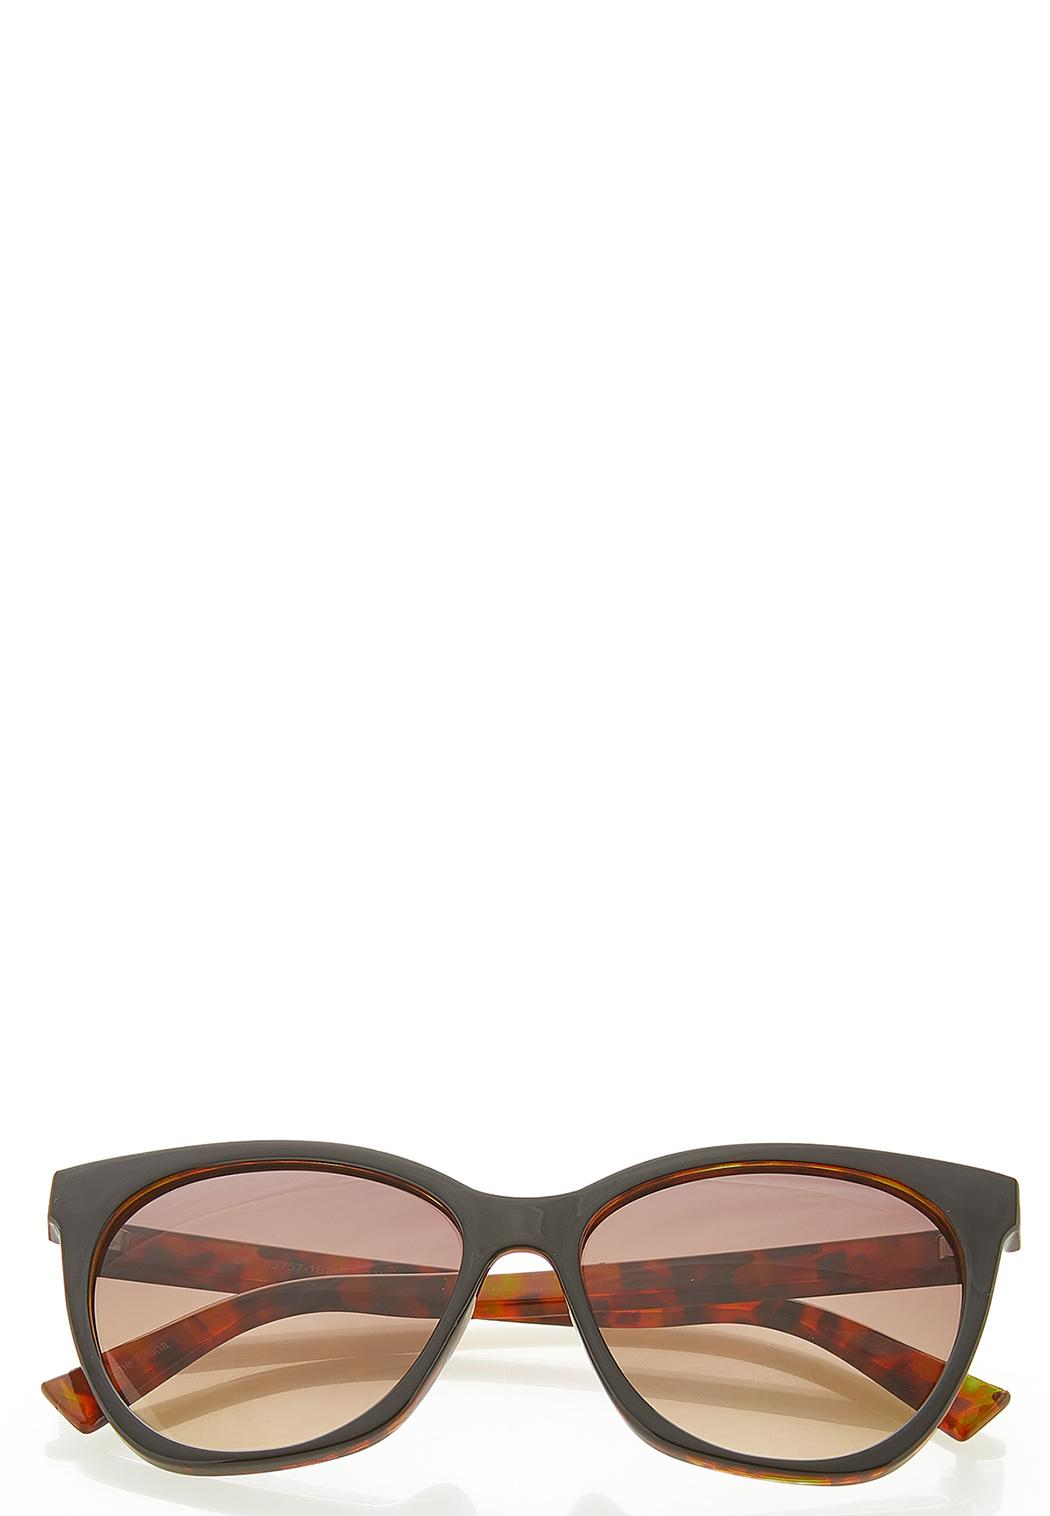 Tortoise Arm Sunglasses